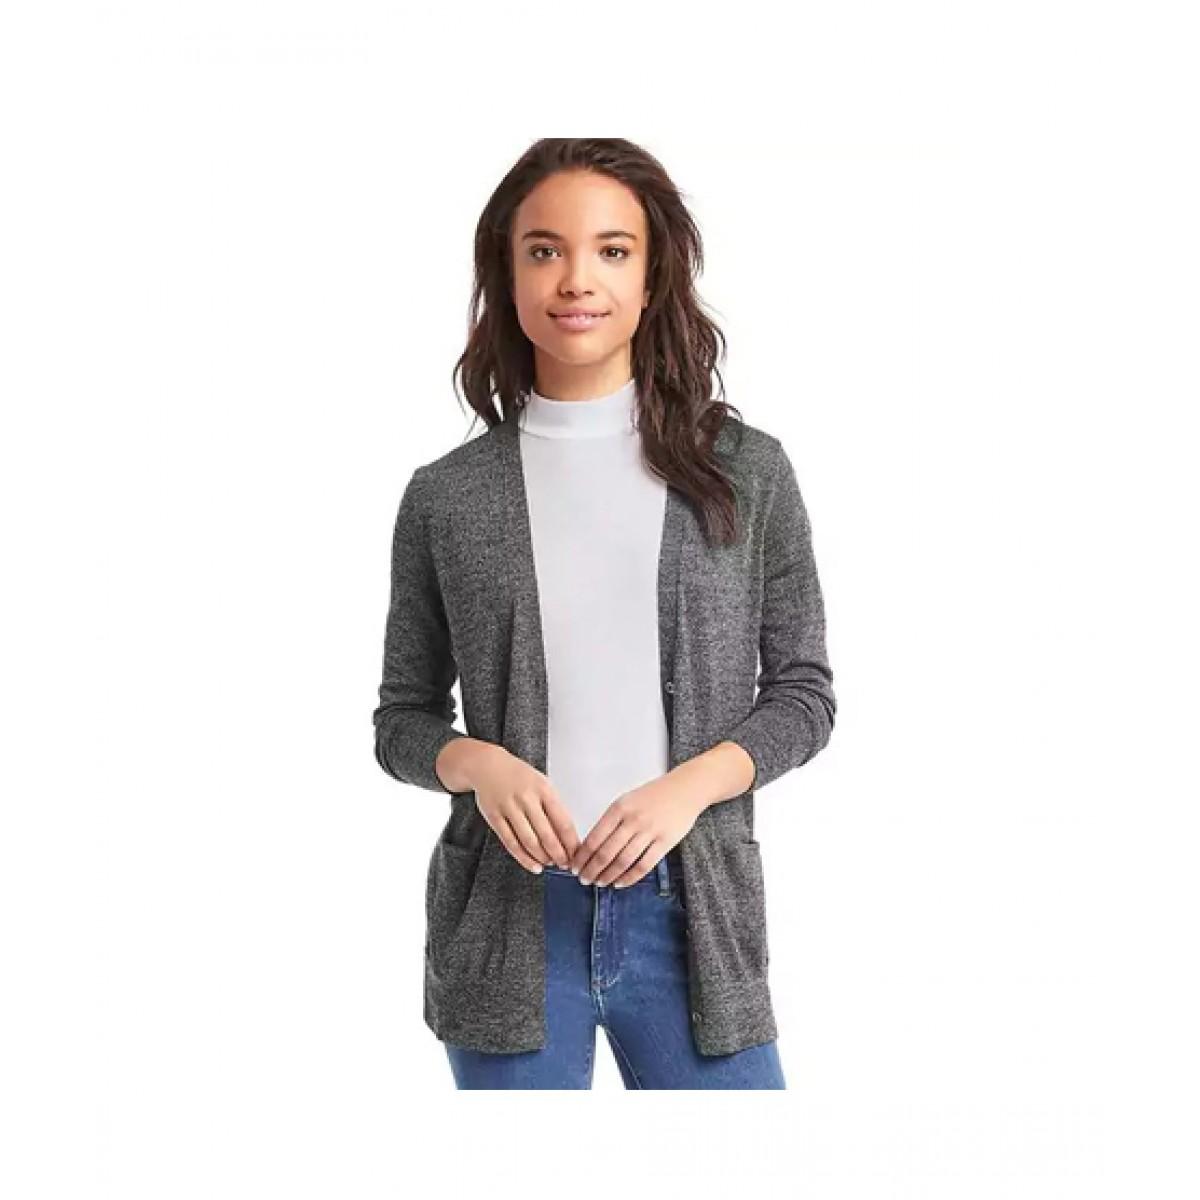 5b3678a163ff01 Gap Wool Cardigan Women's Sweater Price in Pakistan   Buy Gap Merino Sweater  Charcoal Heather   iShopping.pk